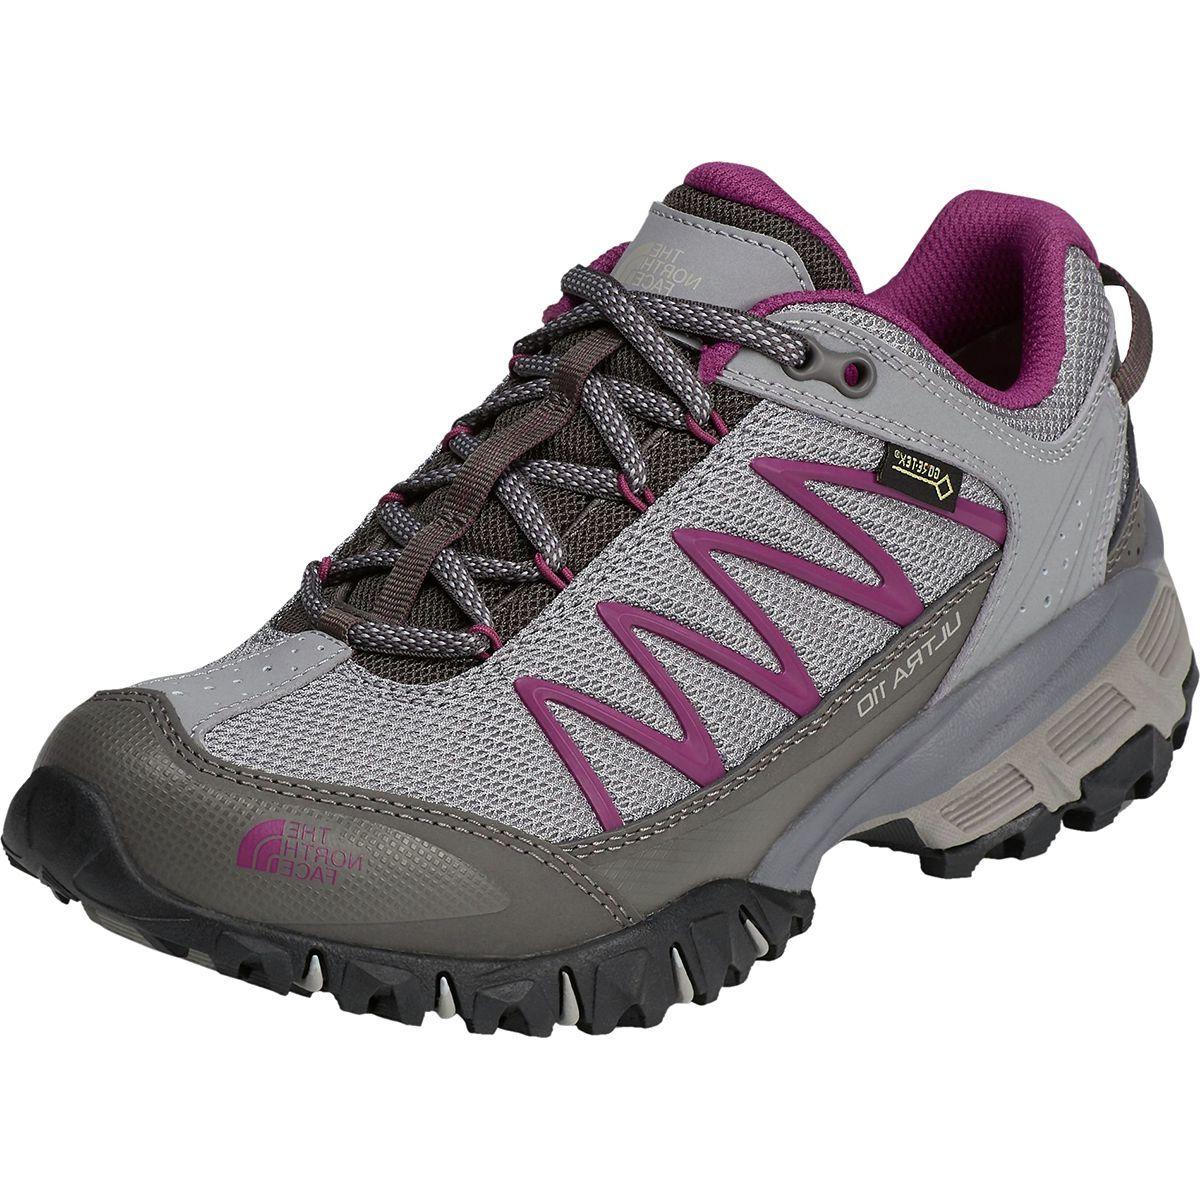 The North Face Ultra 110 GTX Hiking Shoe - Women's